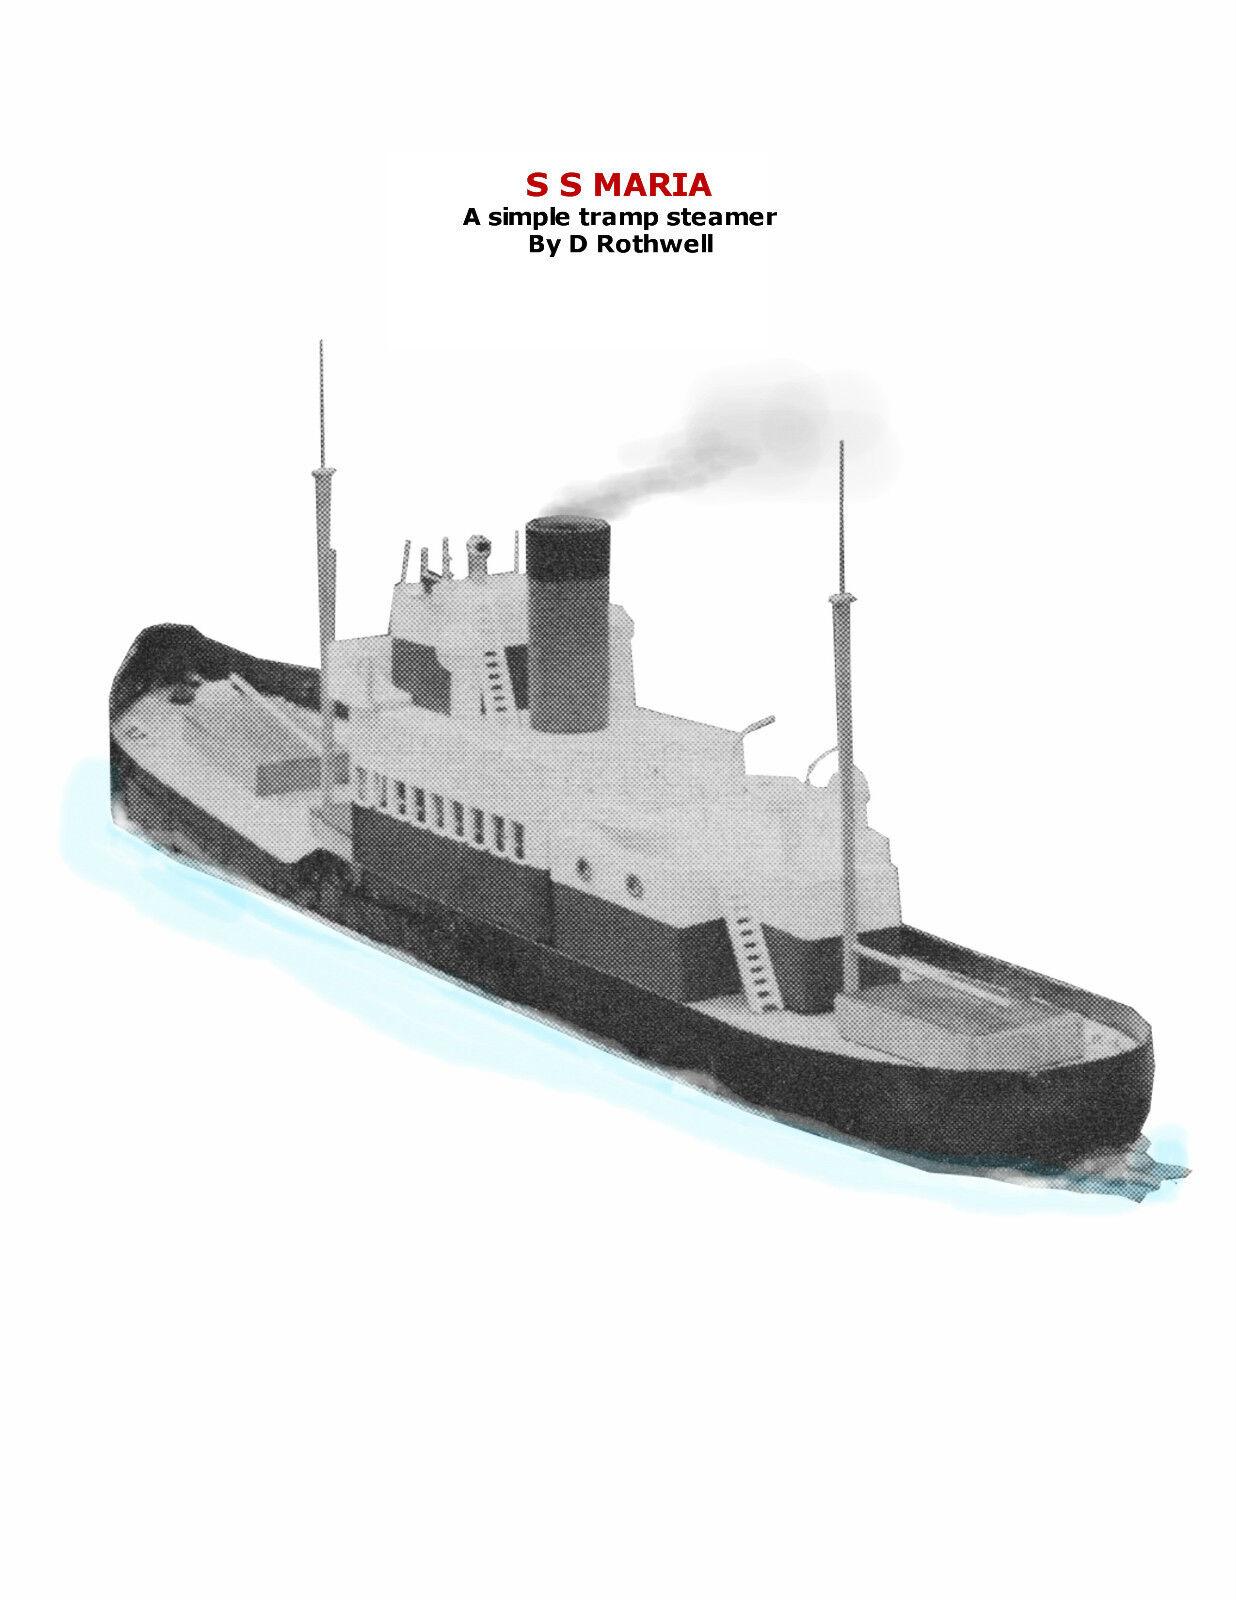 Download Boat plans ebay ~ Clint